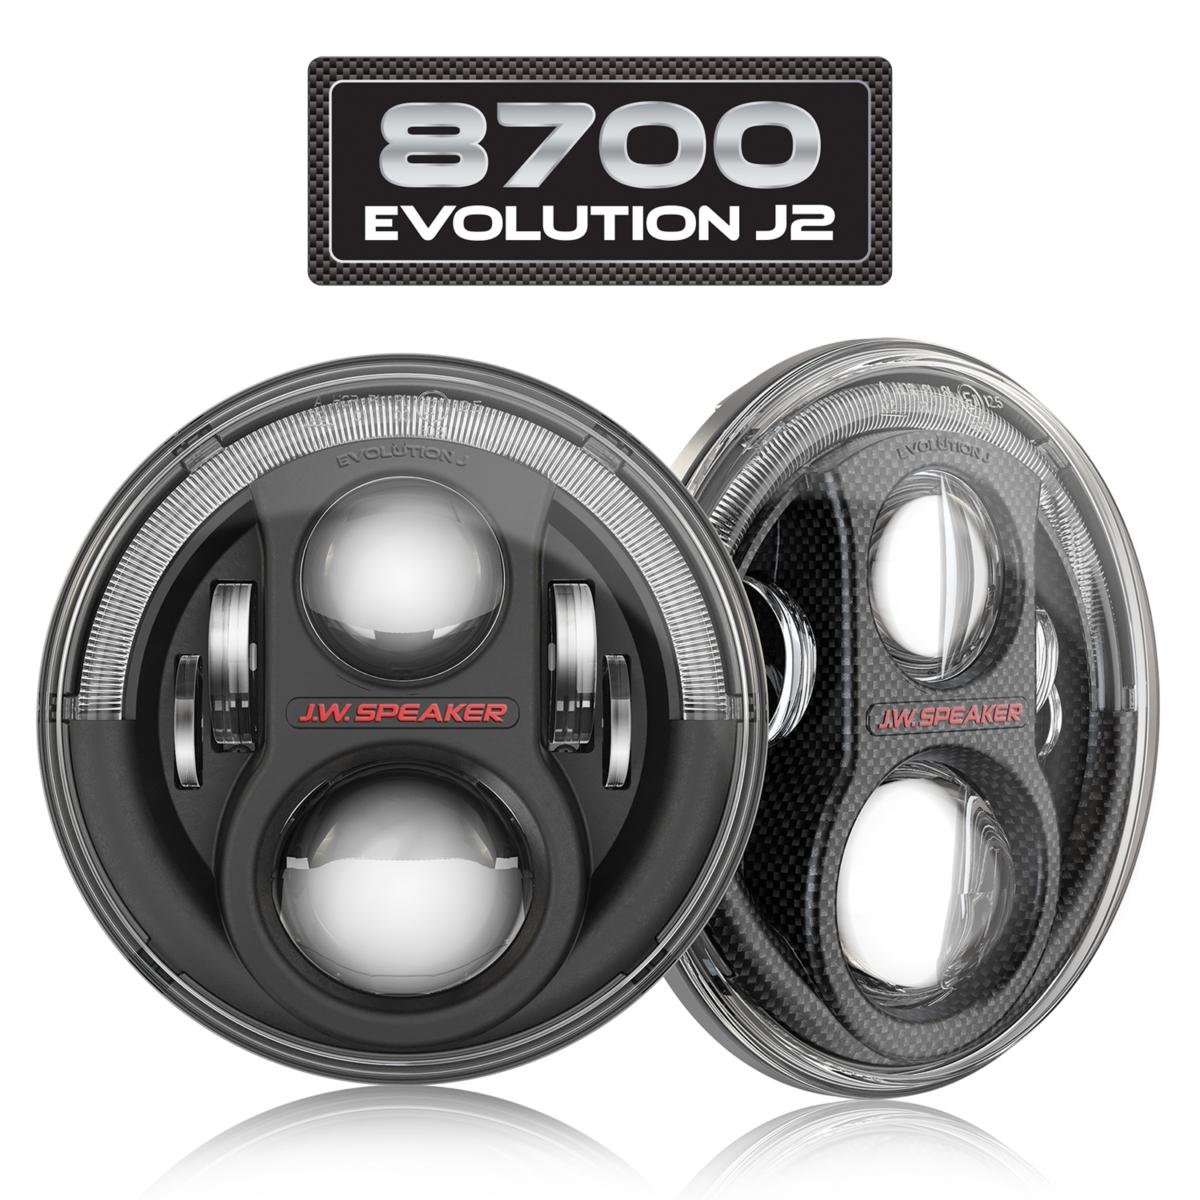 LED Hauptscheinwerfer J.W. Speaker 8700 Evolution J2, Jeep Set